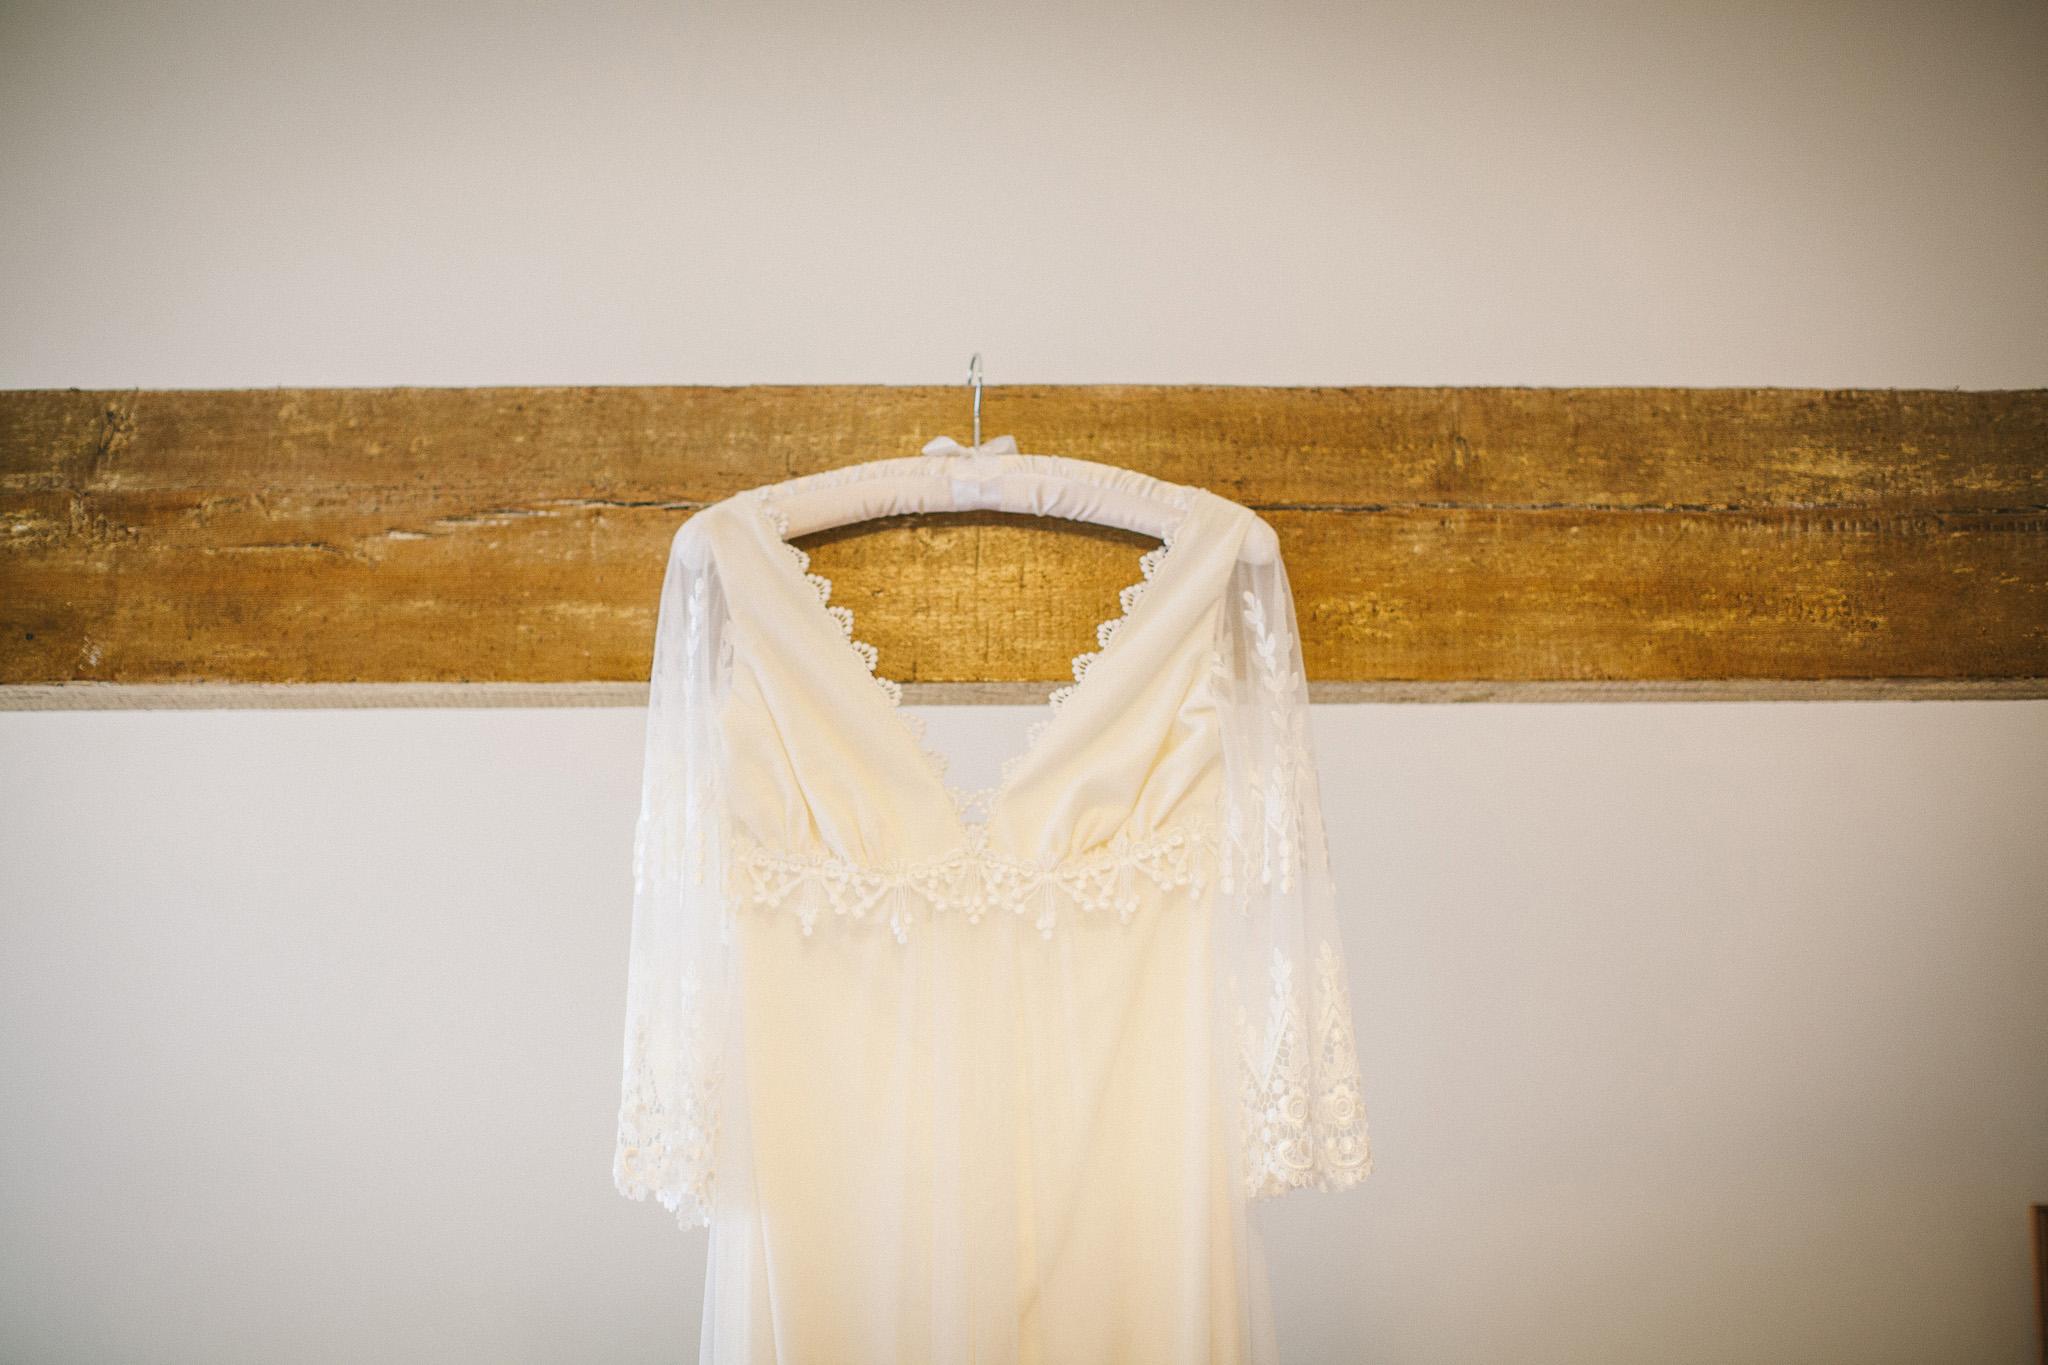 chantry_sussex_barn_wedding_282.jpg